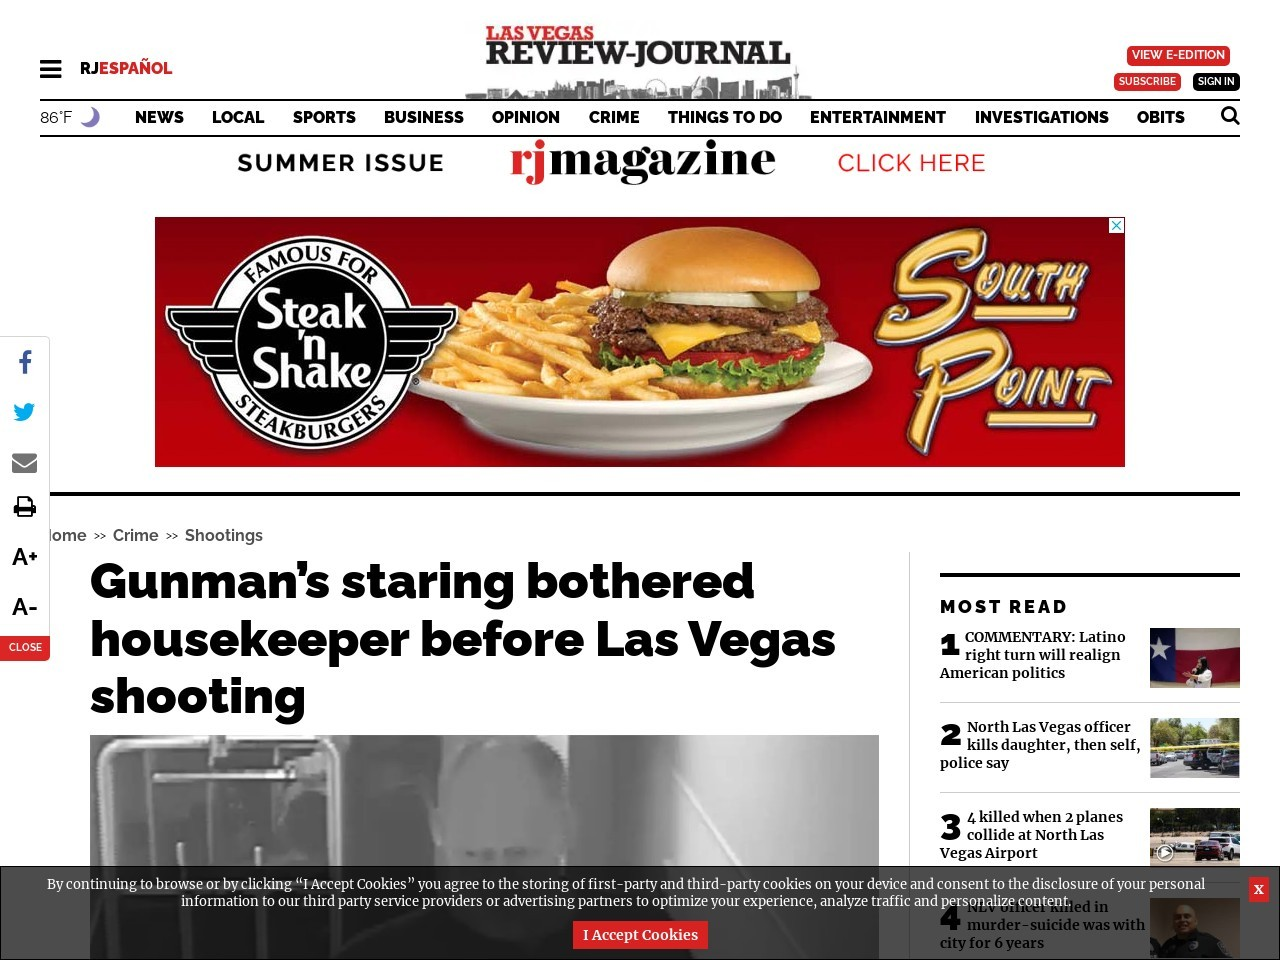 Gunman's staring bothered housekeeper before Las Vegas shooting